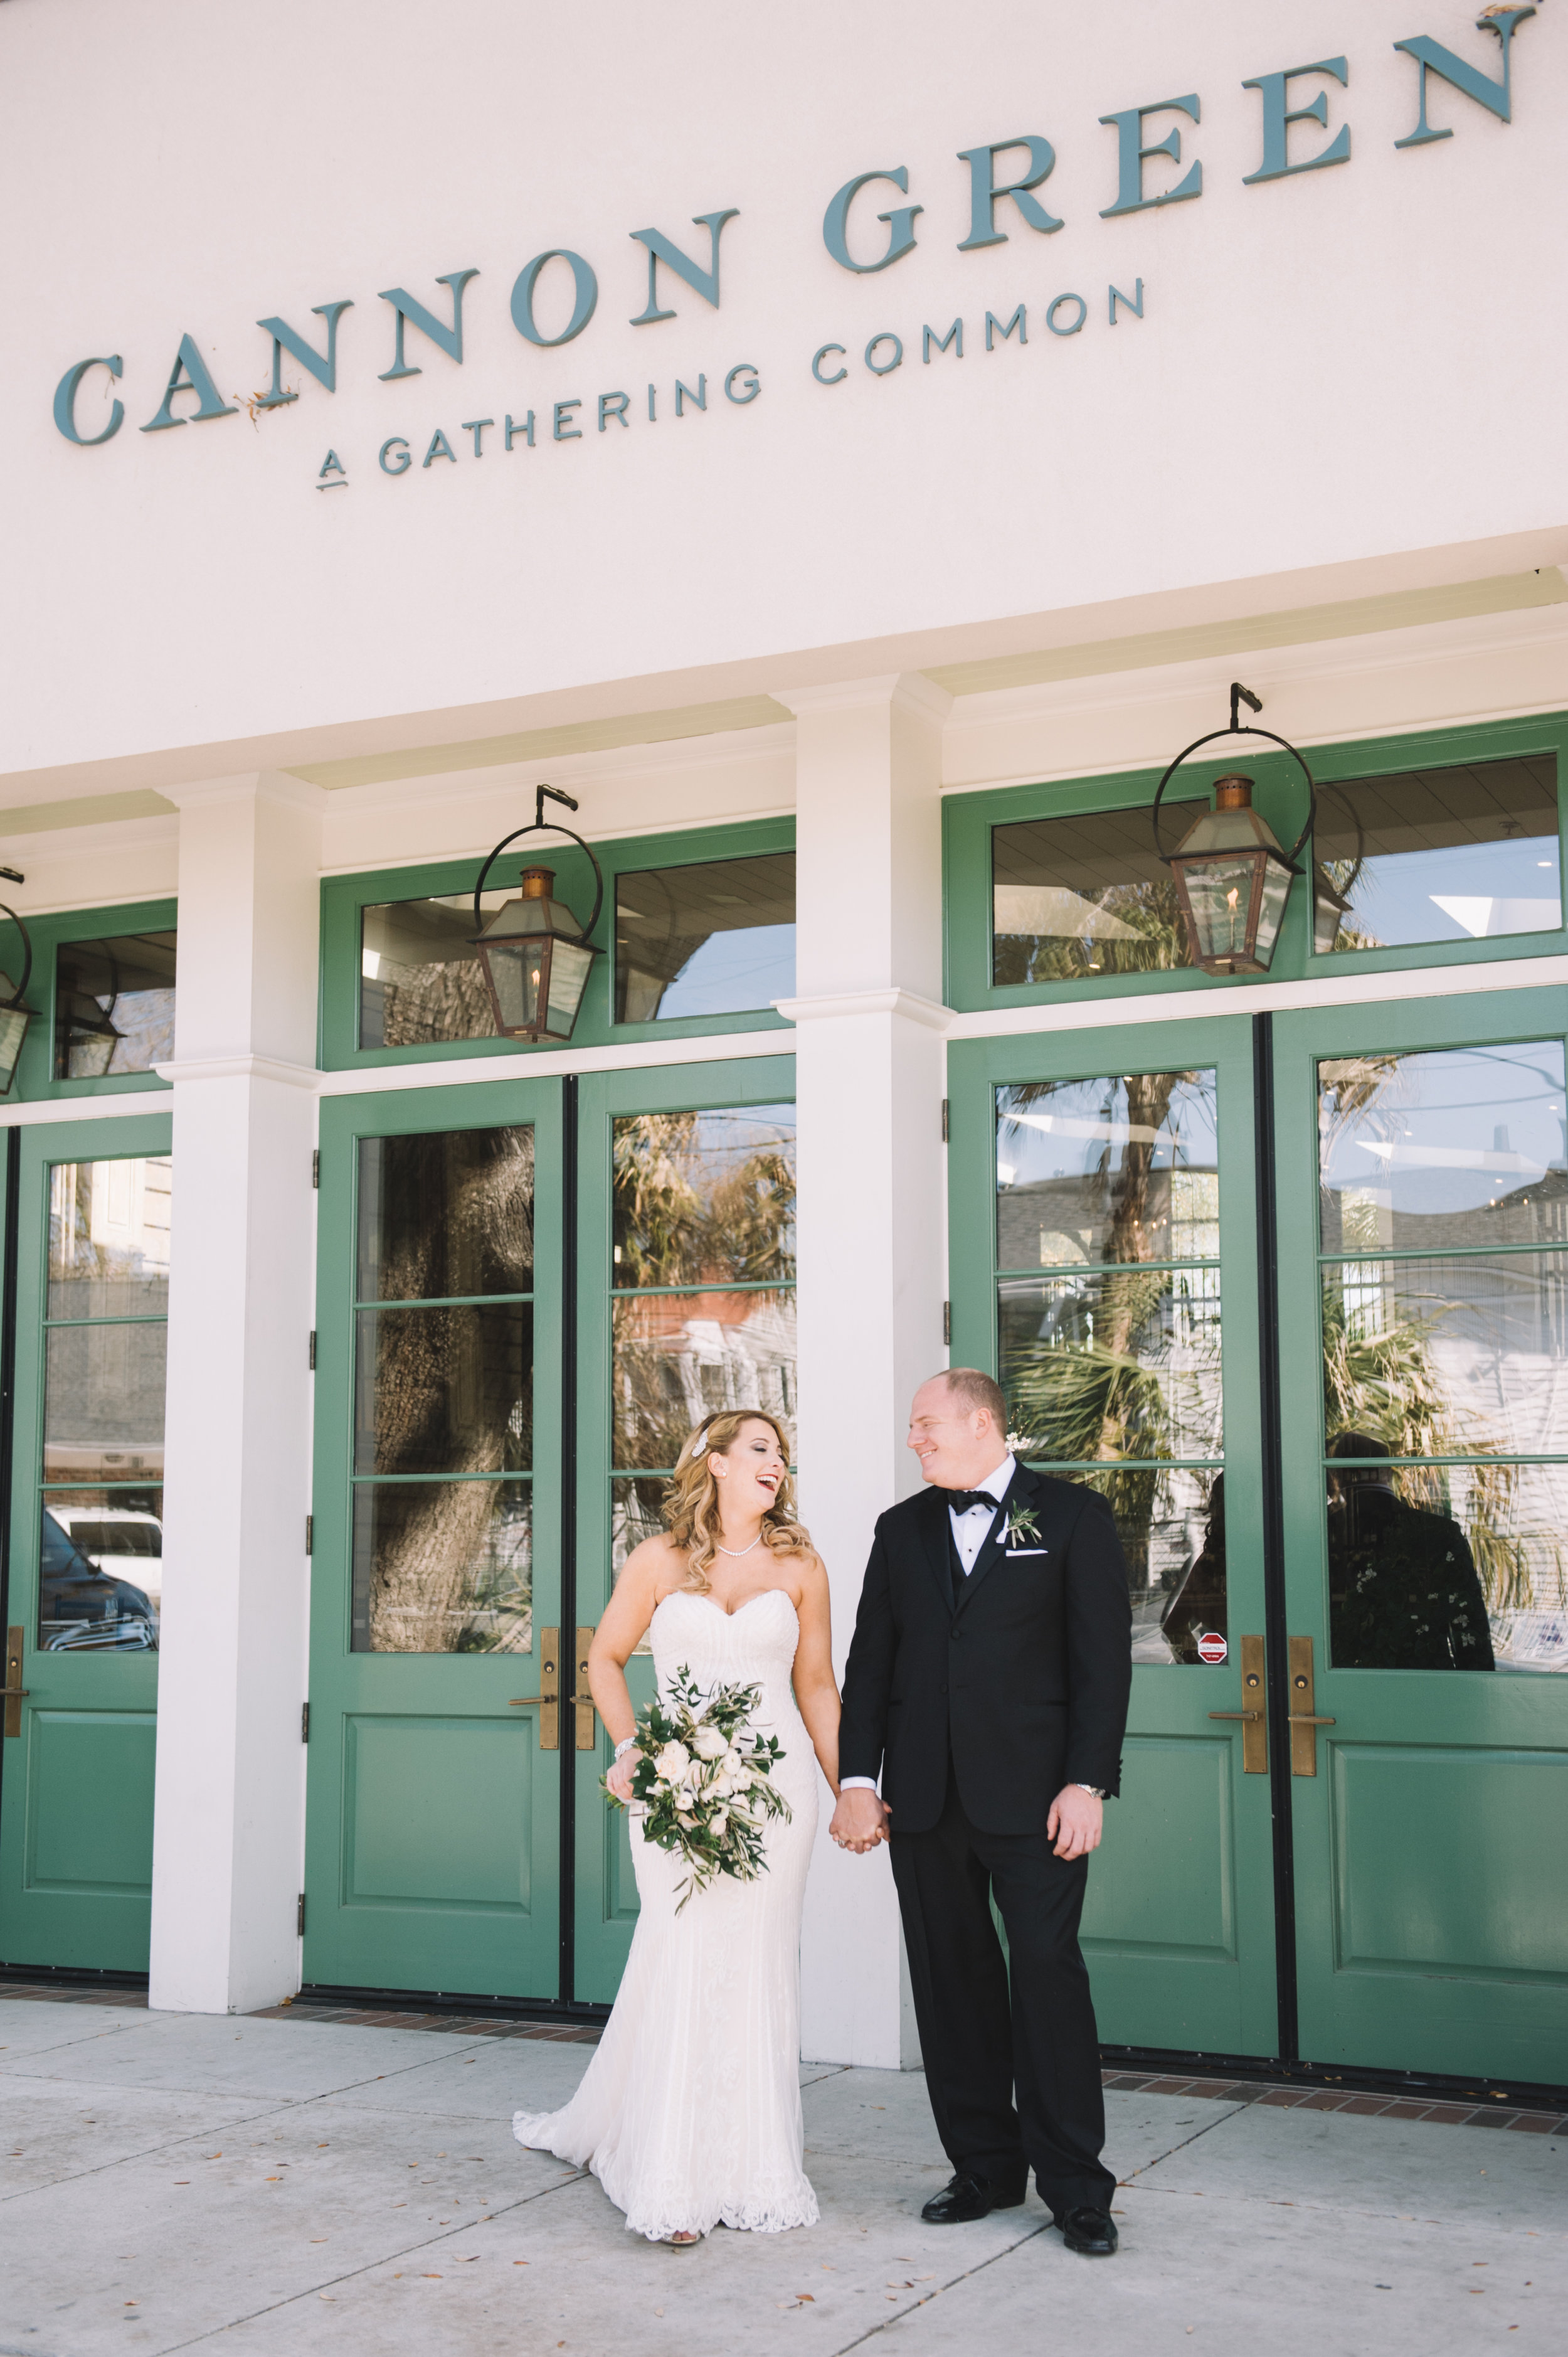 001_2061_ChelseaAndPaul_WeddingFavOfJennings.jpg